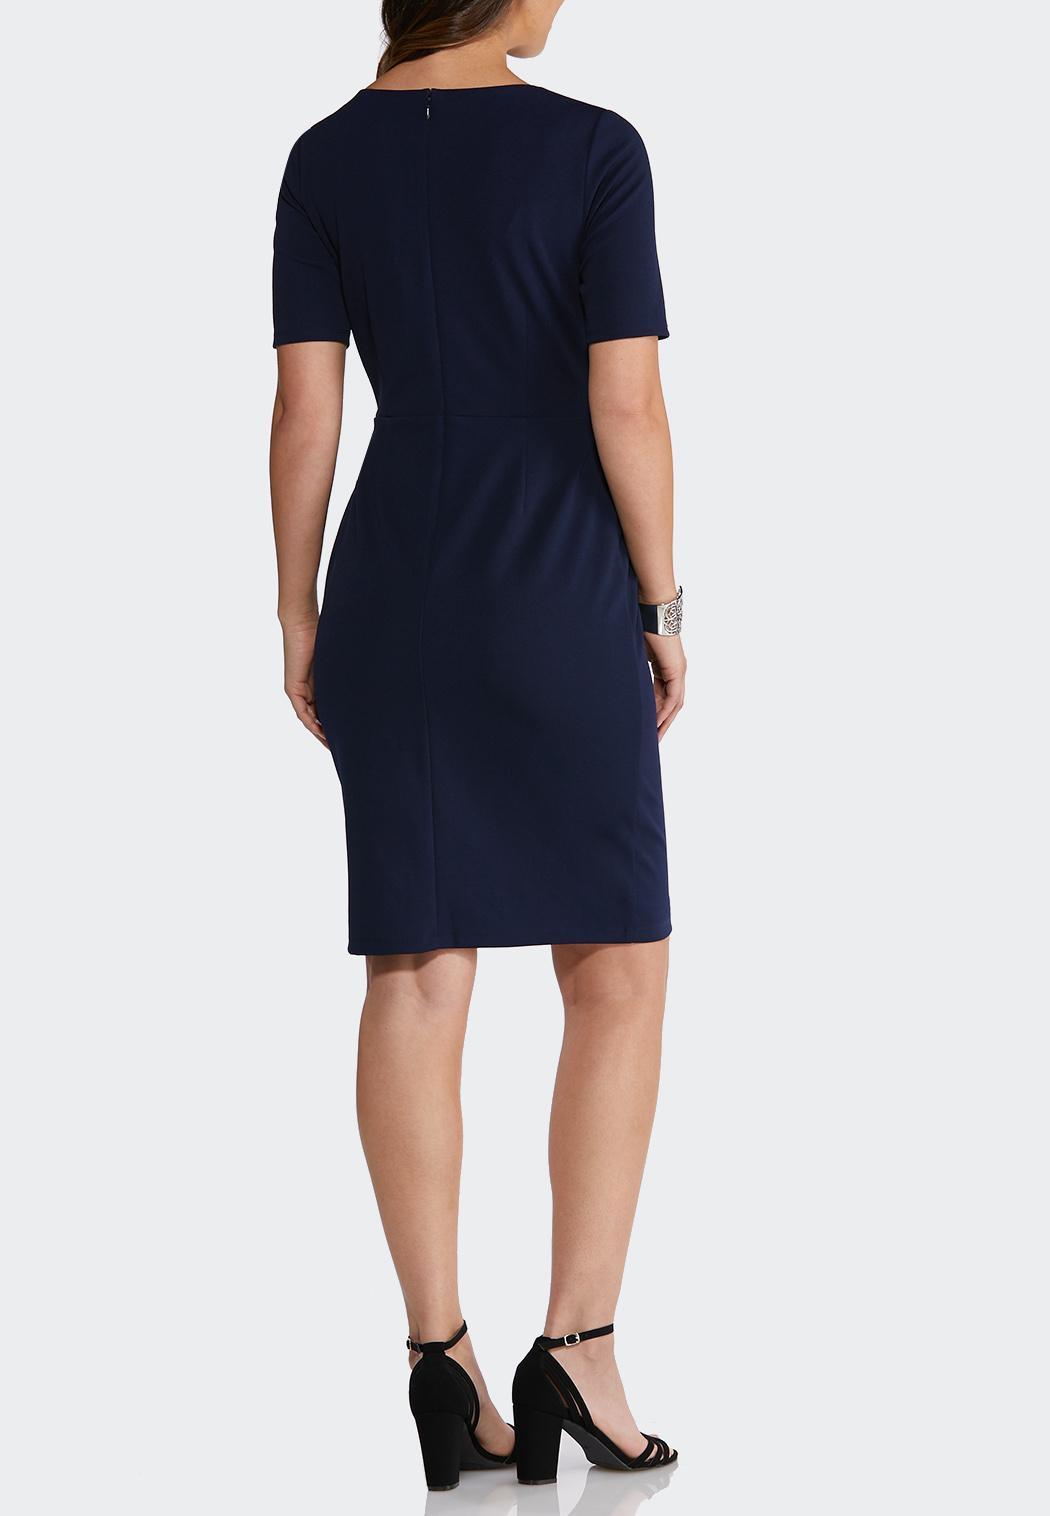 Tie Waist Sheath Dress (Item #43749484)